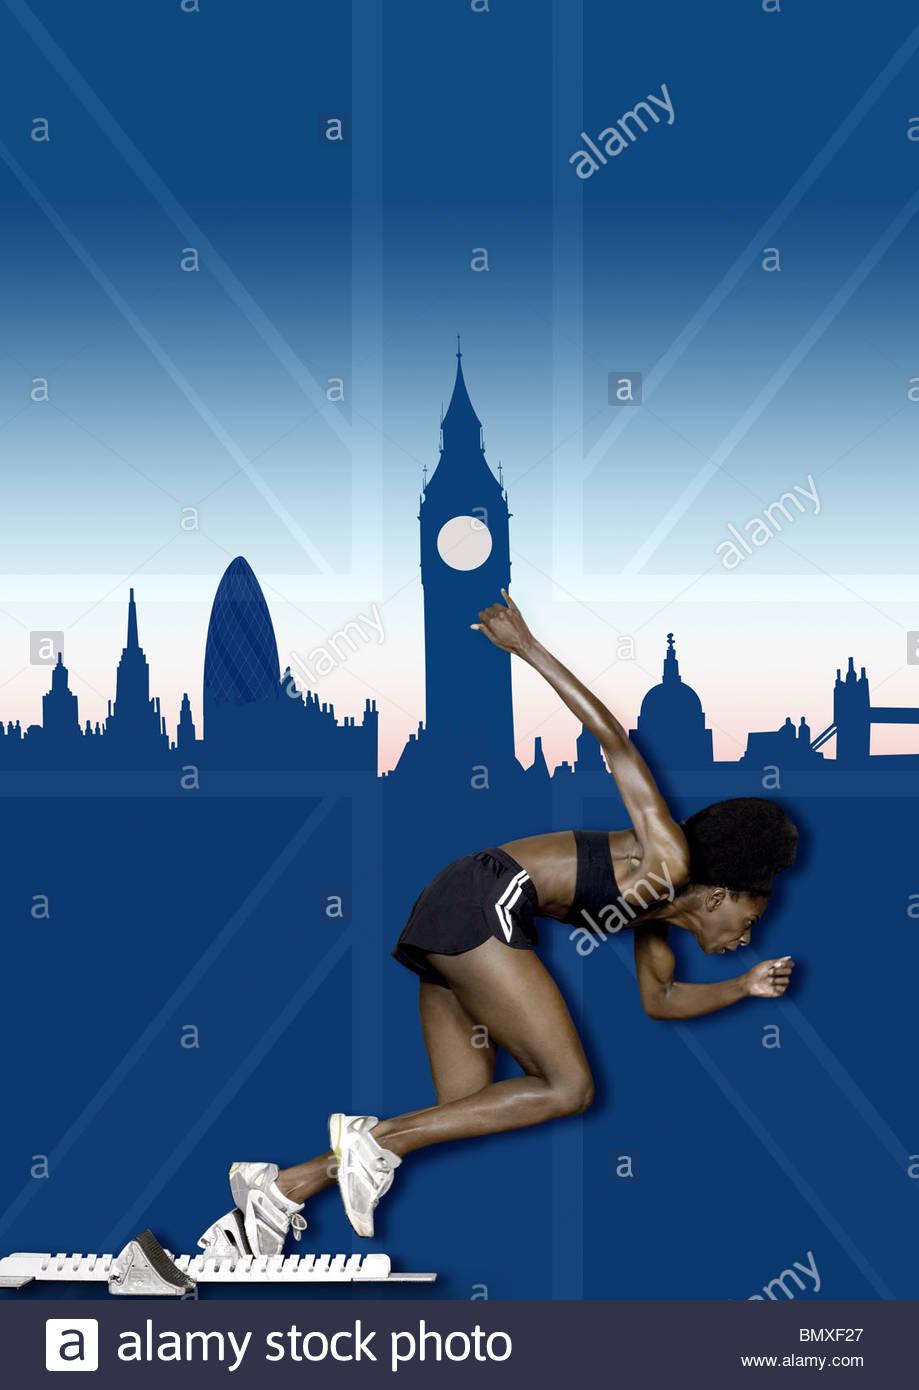 Athlete and london skyline - Stock Image